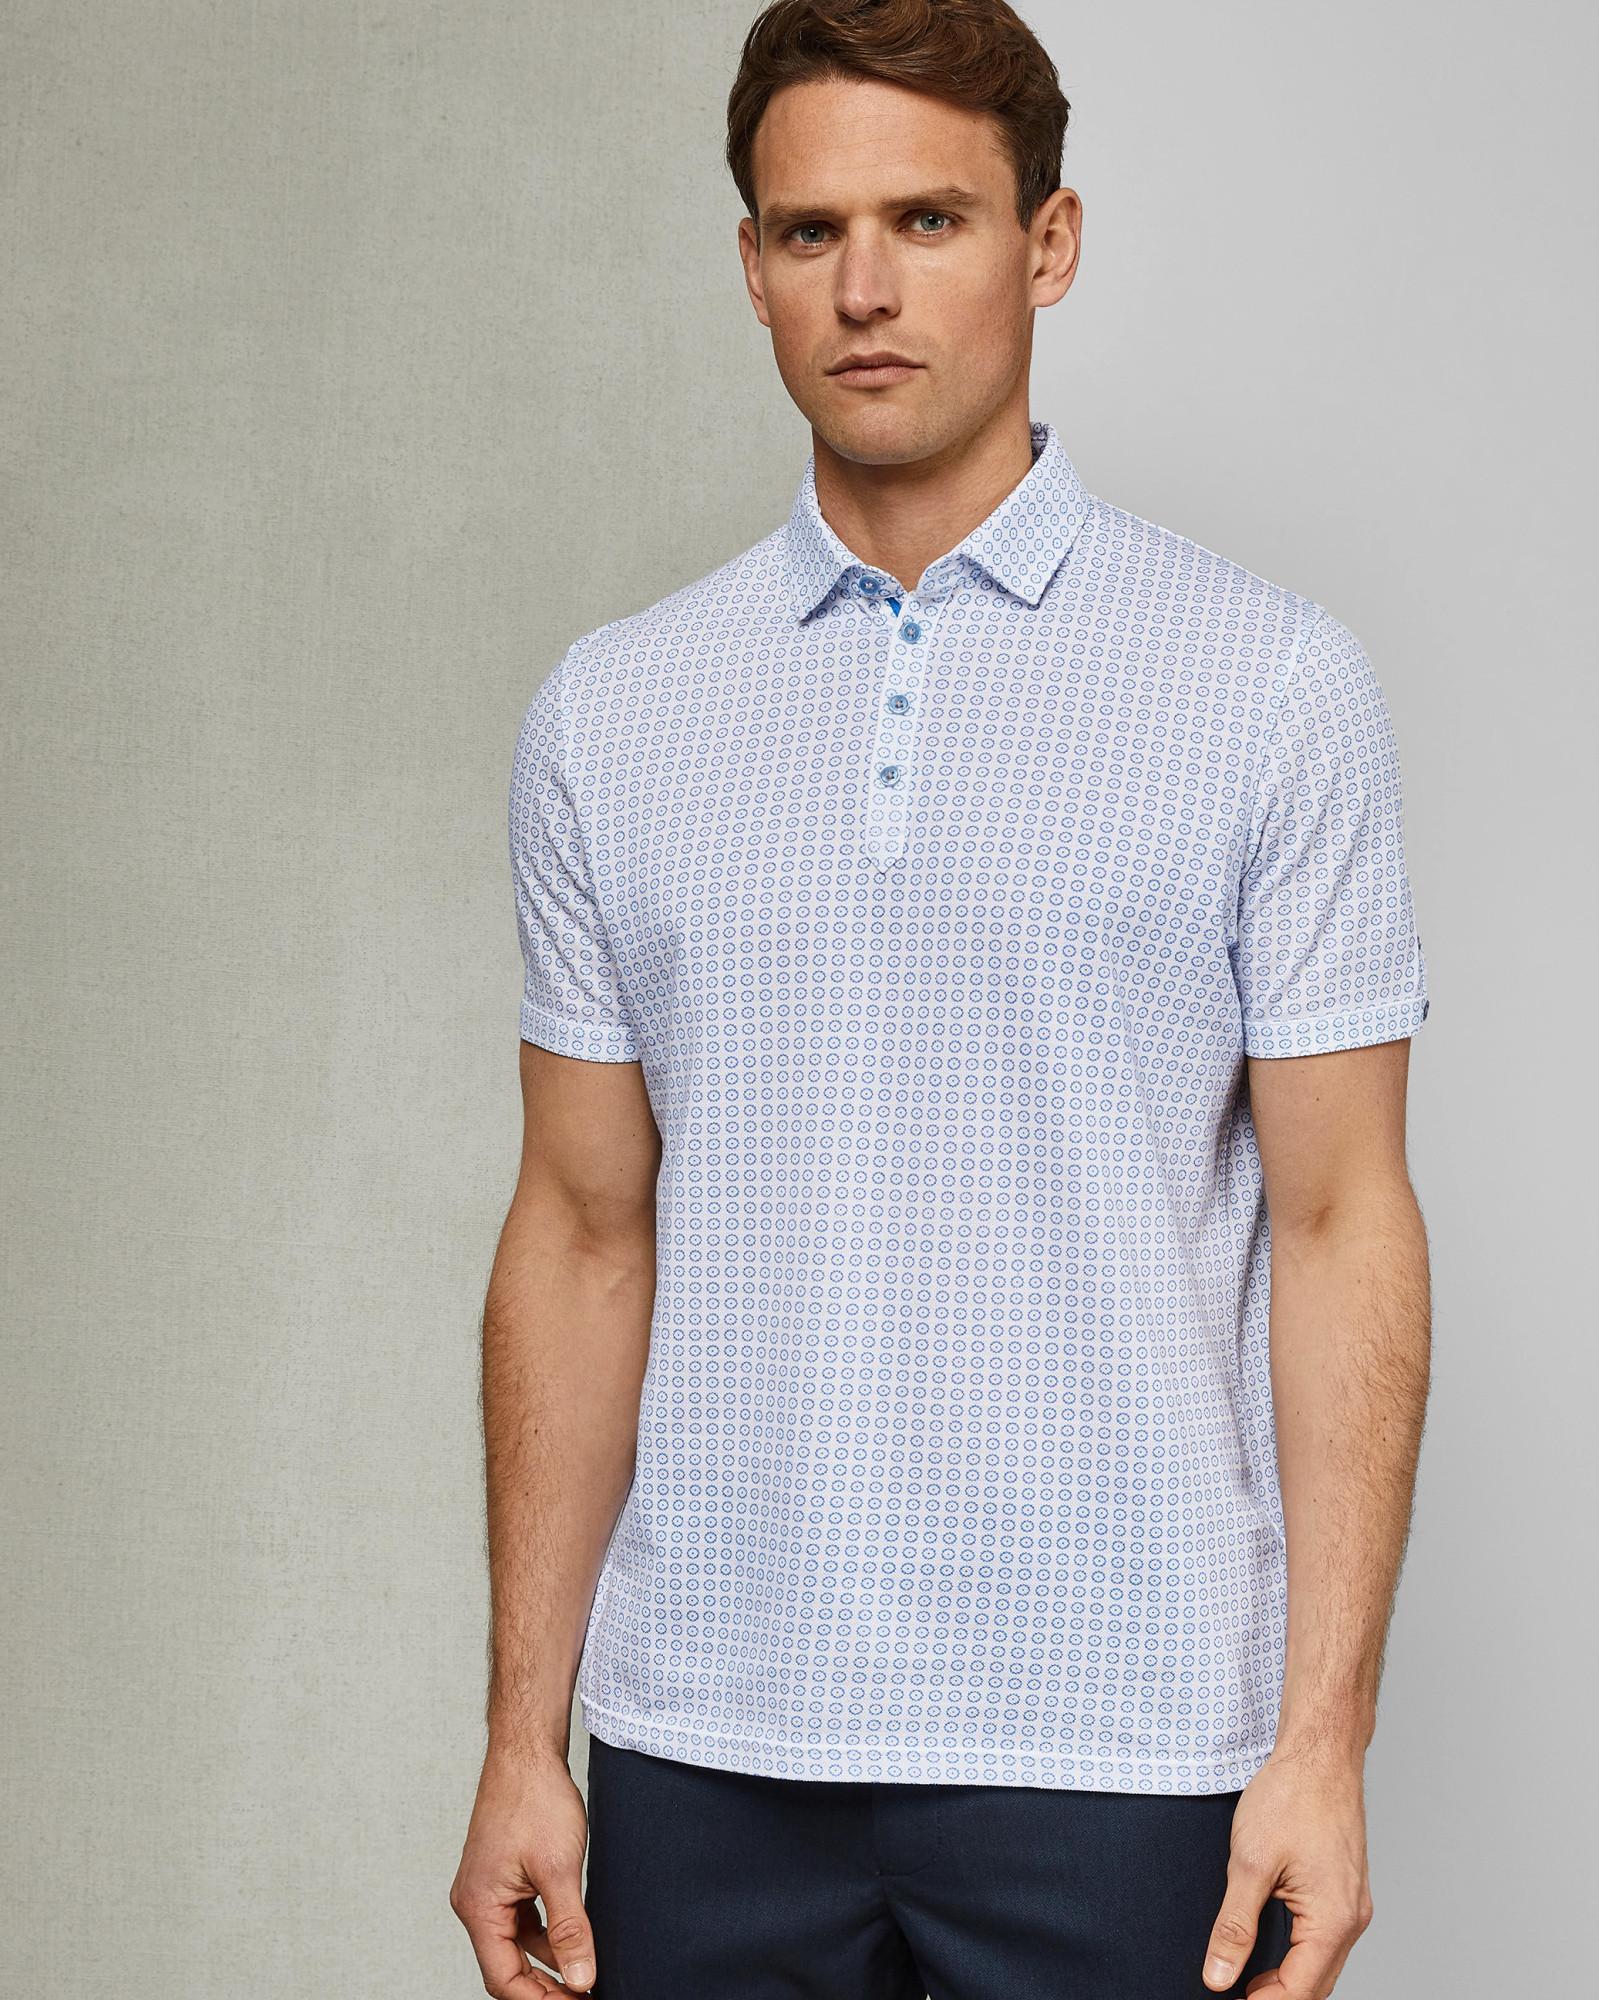 c96380b02062 Lyst - Ted Baker Flee Geometric Print Regular Fit Polo Shirt in Blue ...